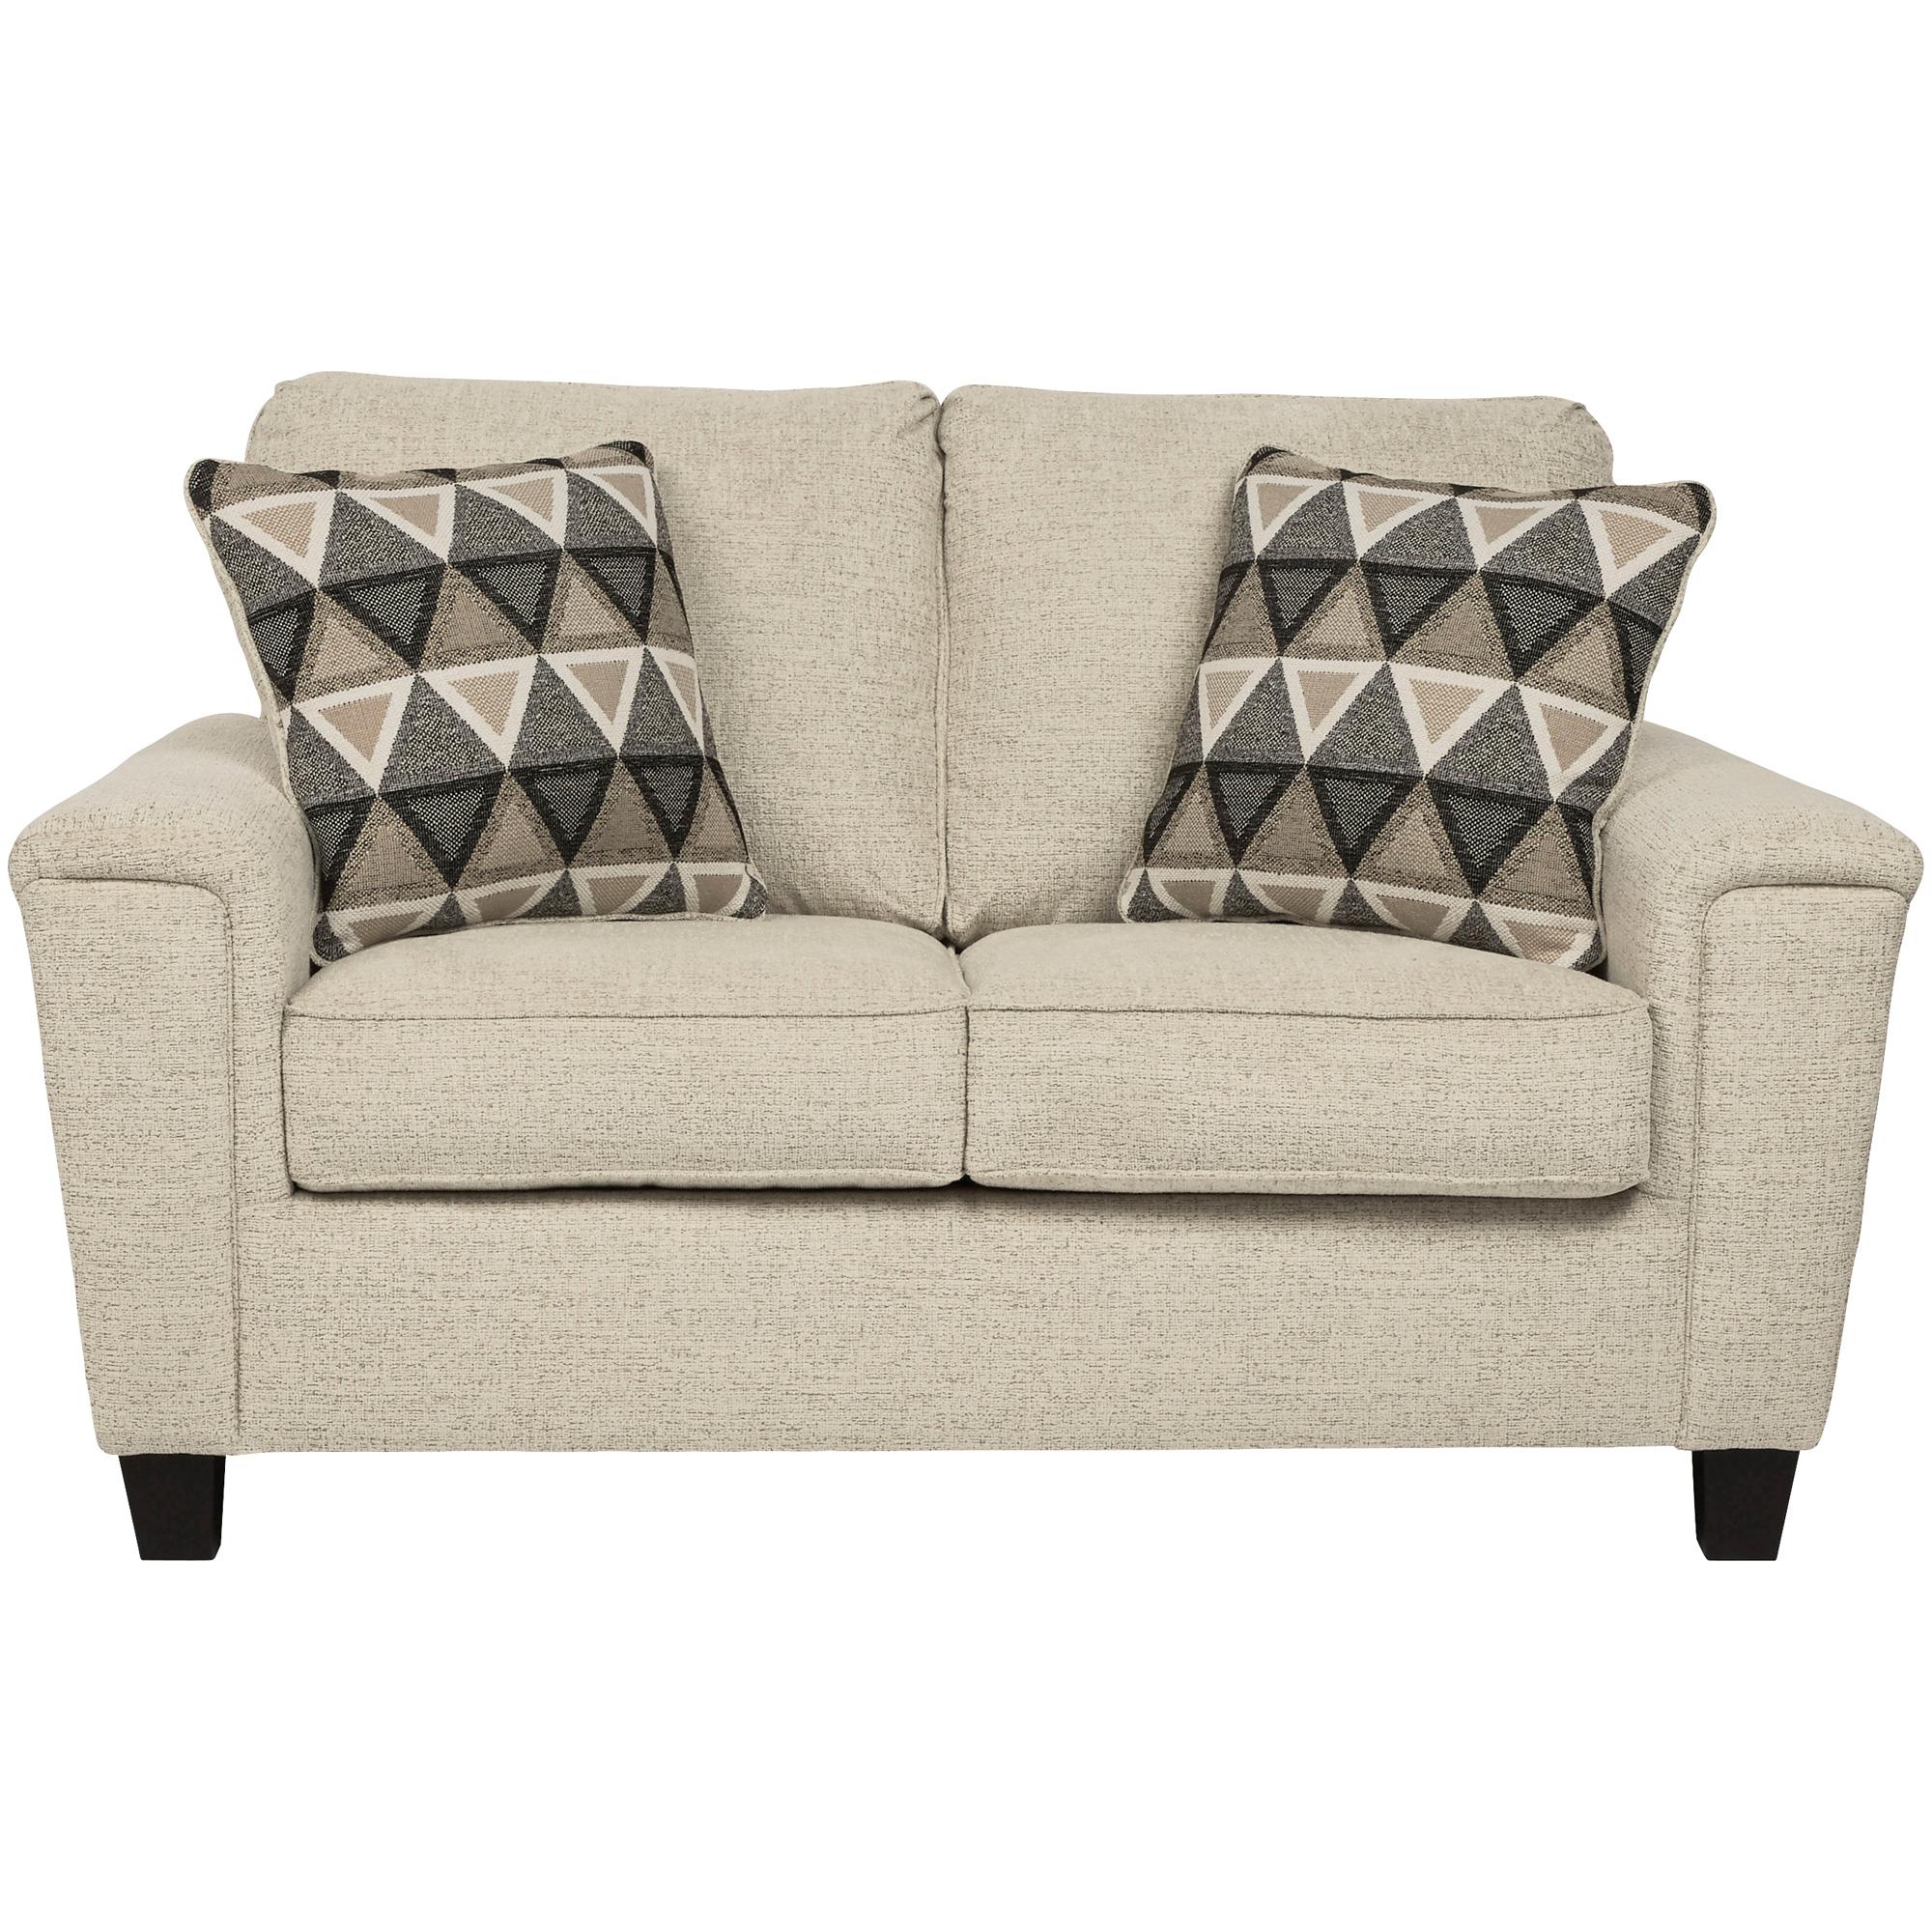 Ashley Furniture | Abinger Natural Loveseat Sofa